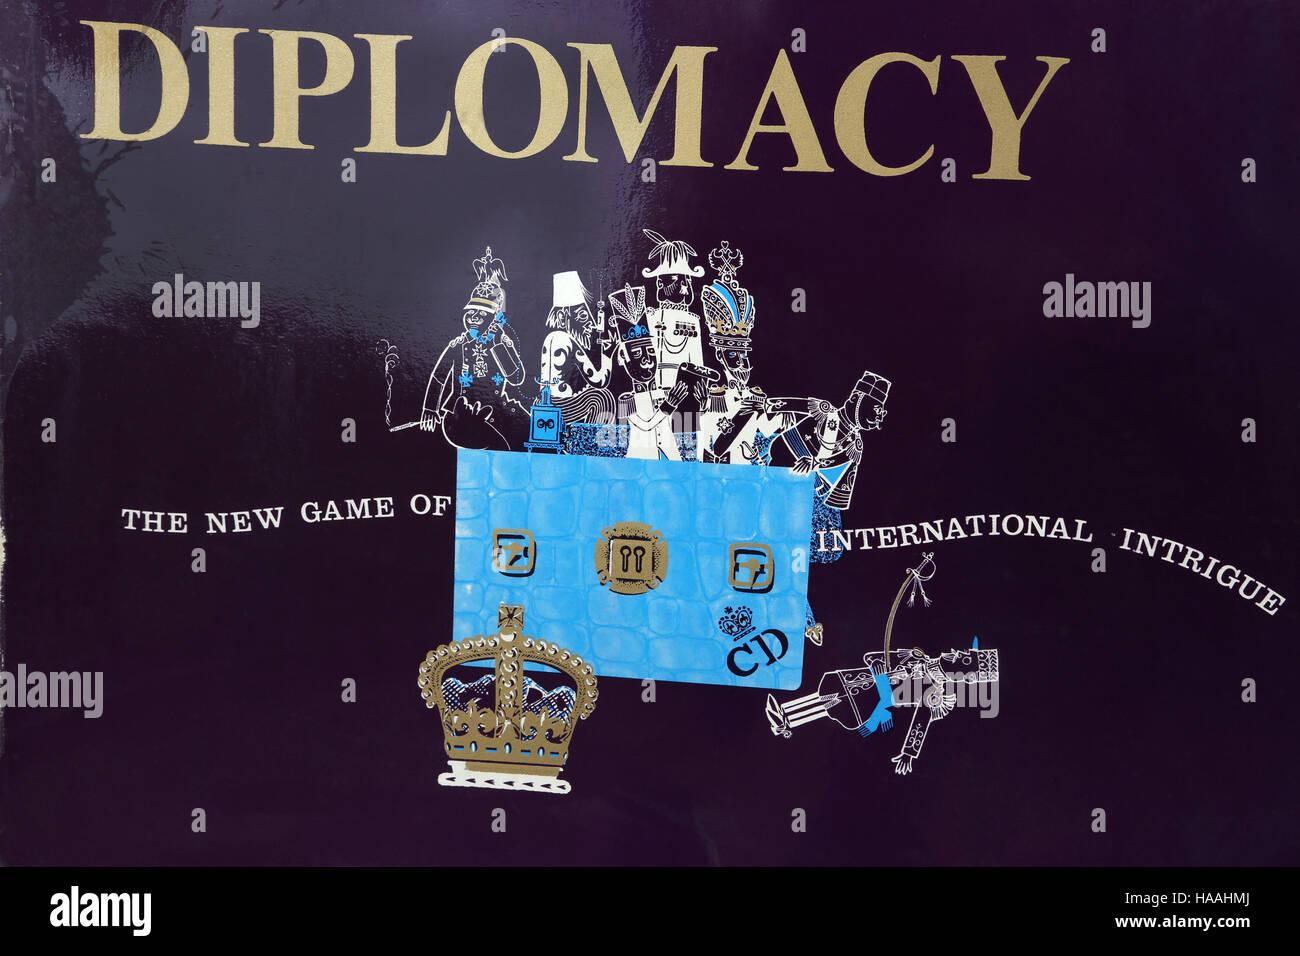 Diplomacy Board Game - Stock Image